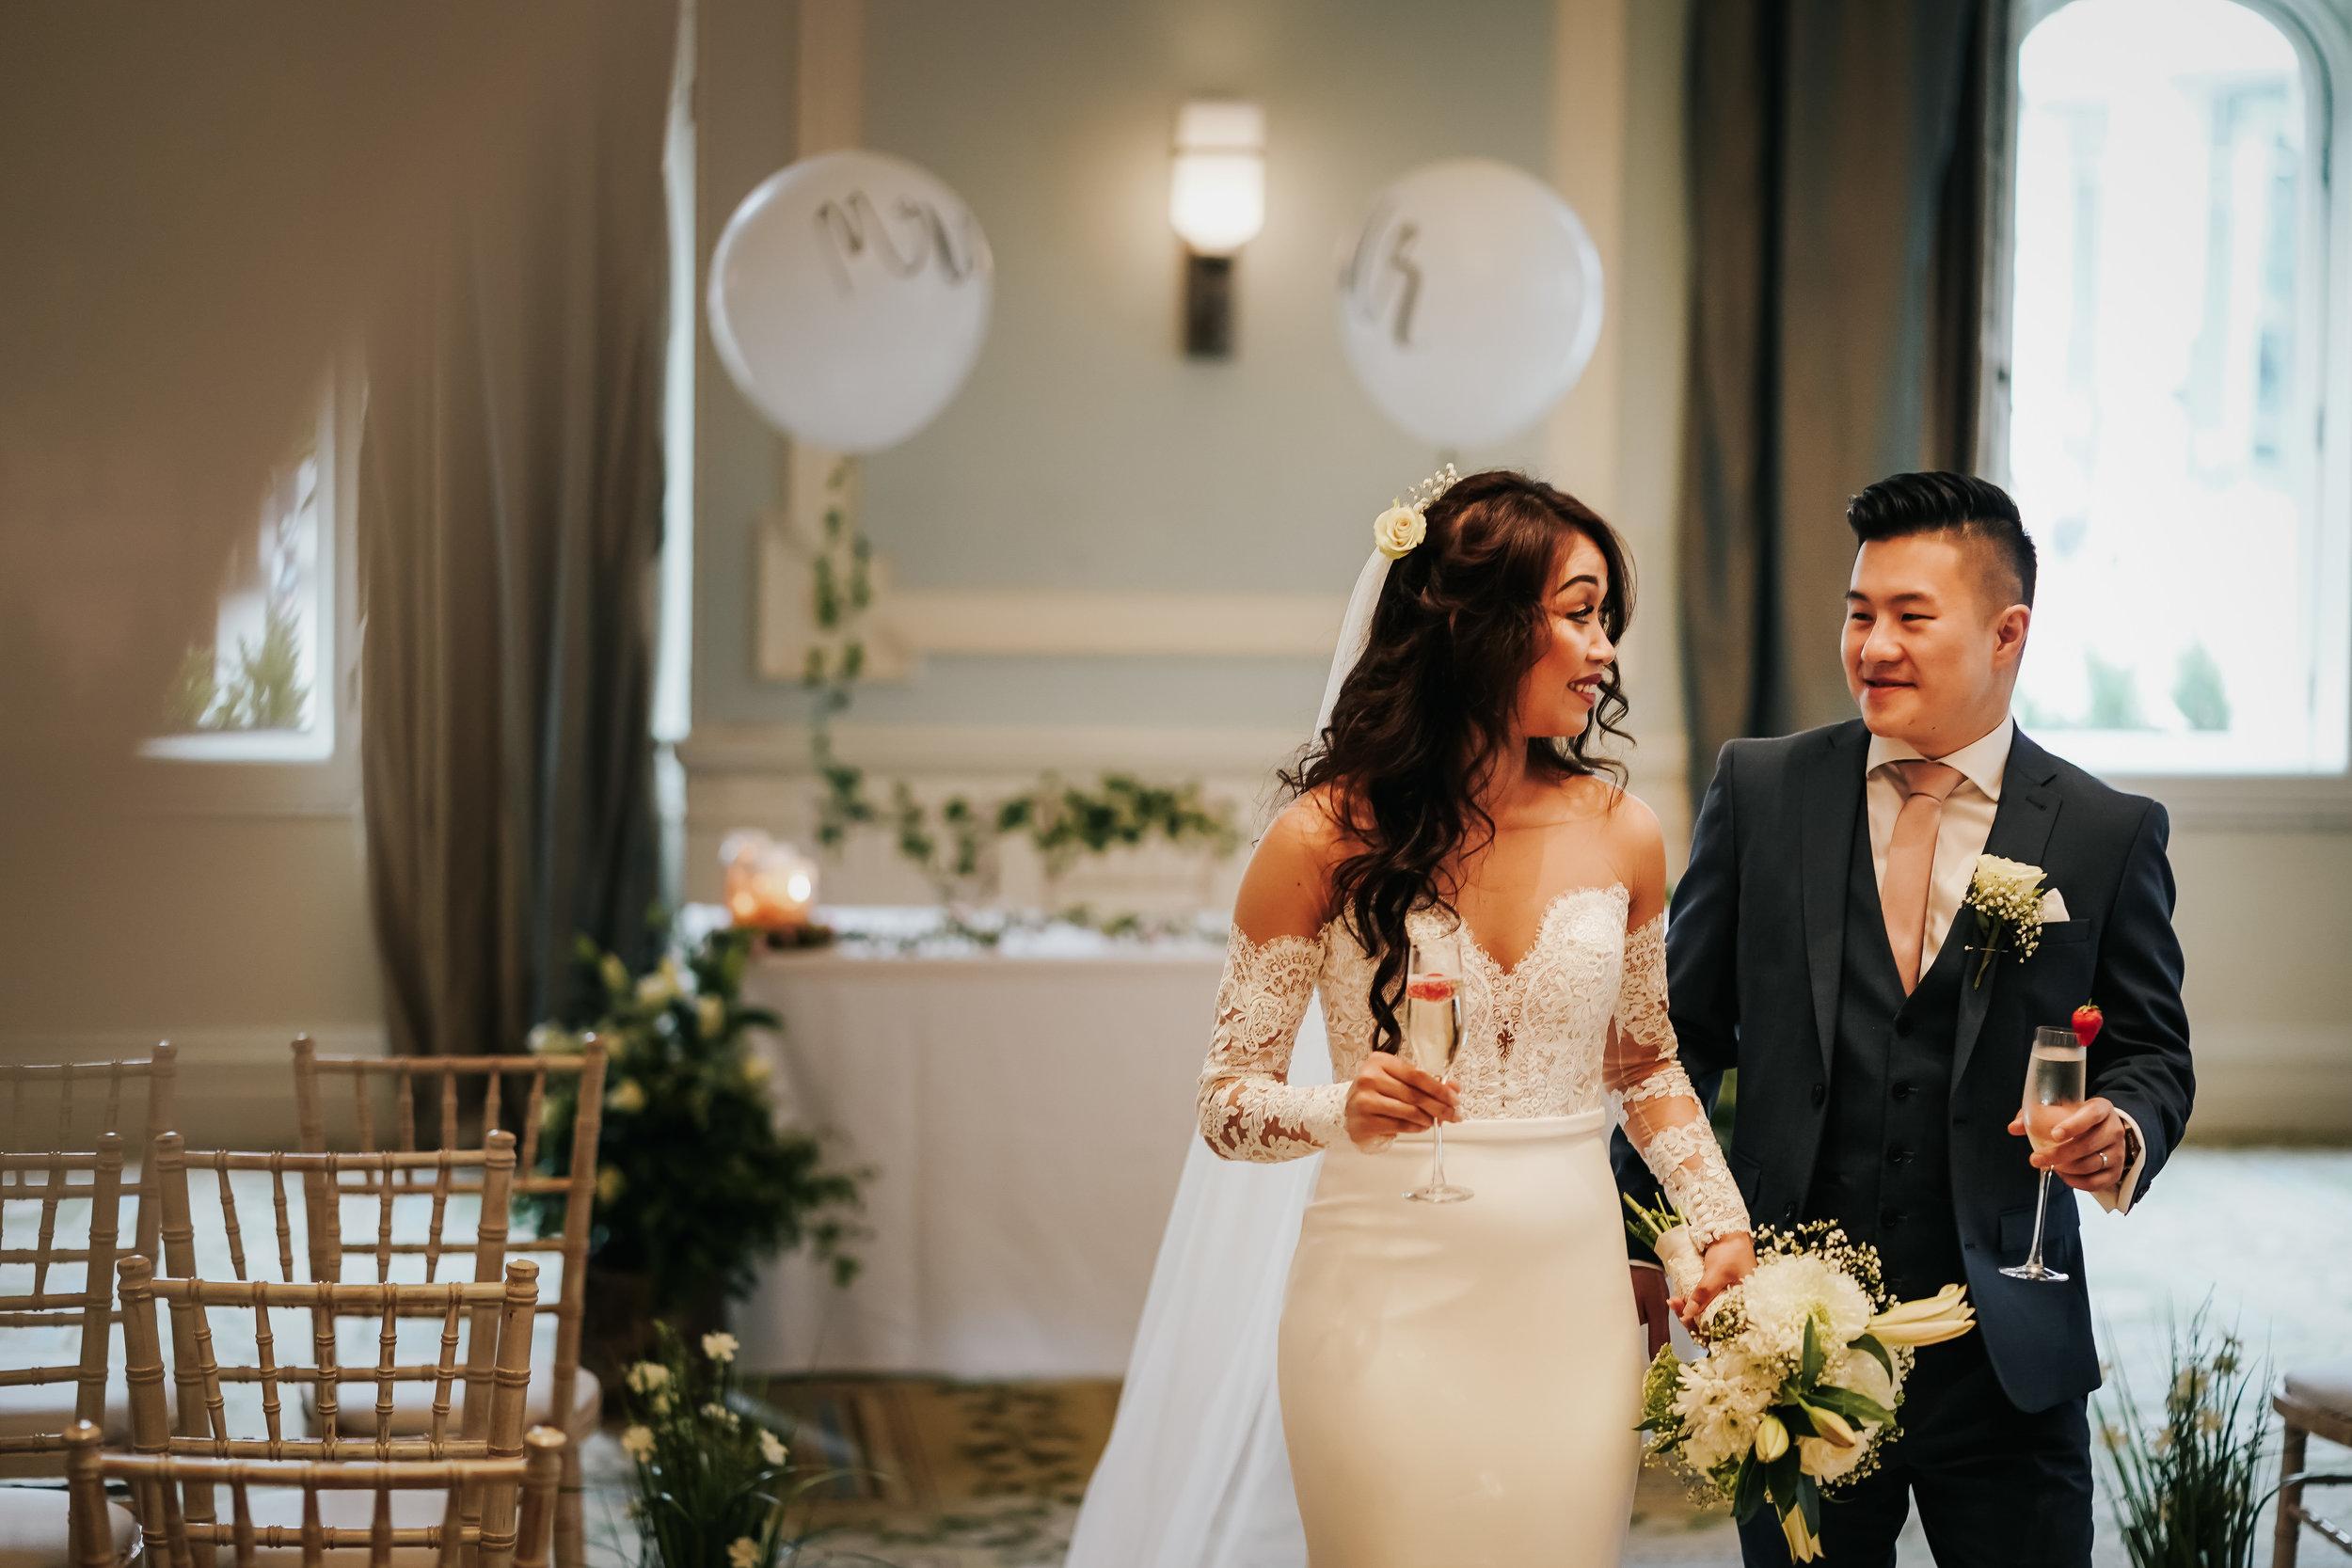 Chinese Wedding Photography Manchester wedding photographer Cheshire - 020.jpg